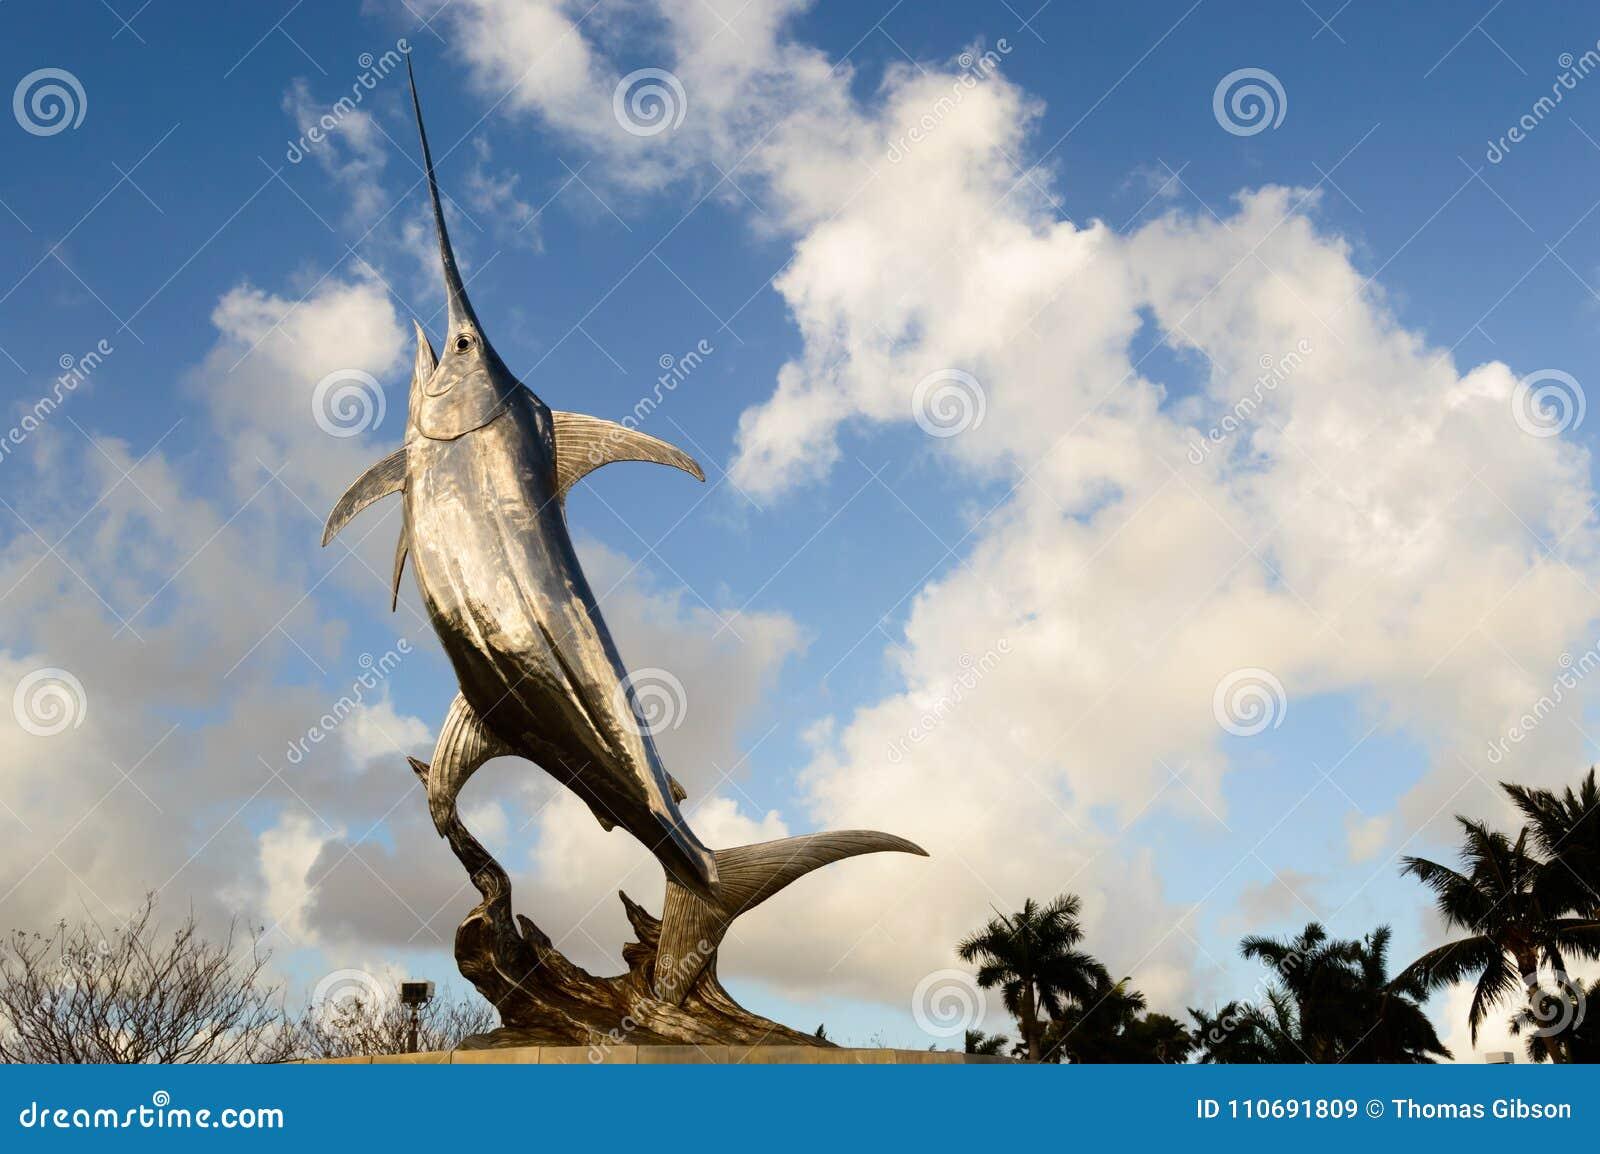 Sailfish statue stock image  Image of blue, wallpaper - 110691809